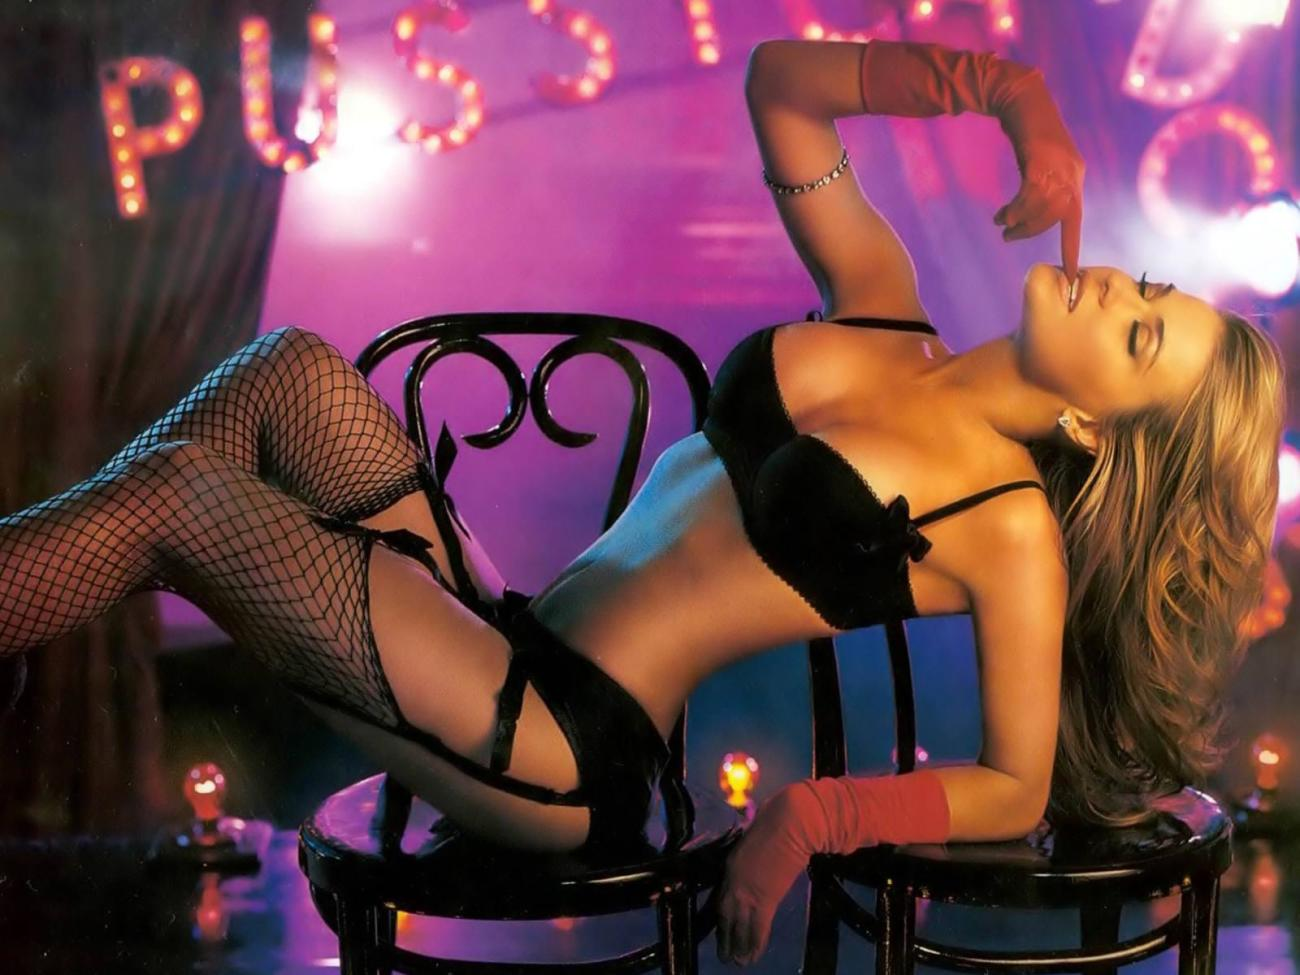 Girl strip hot